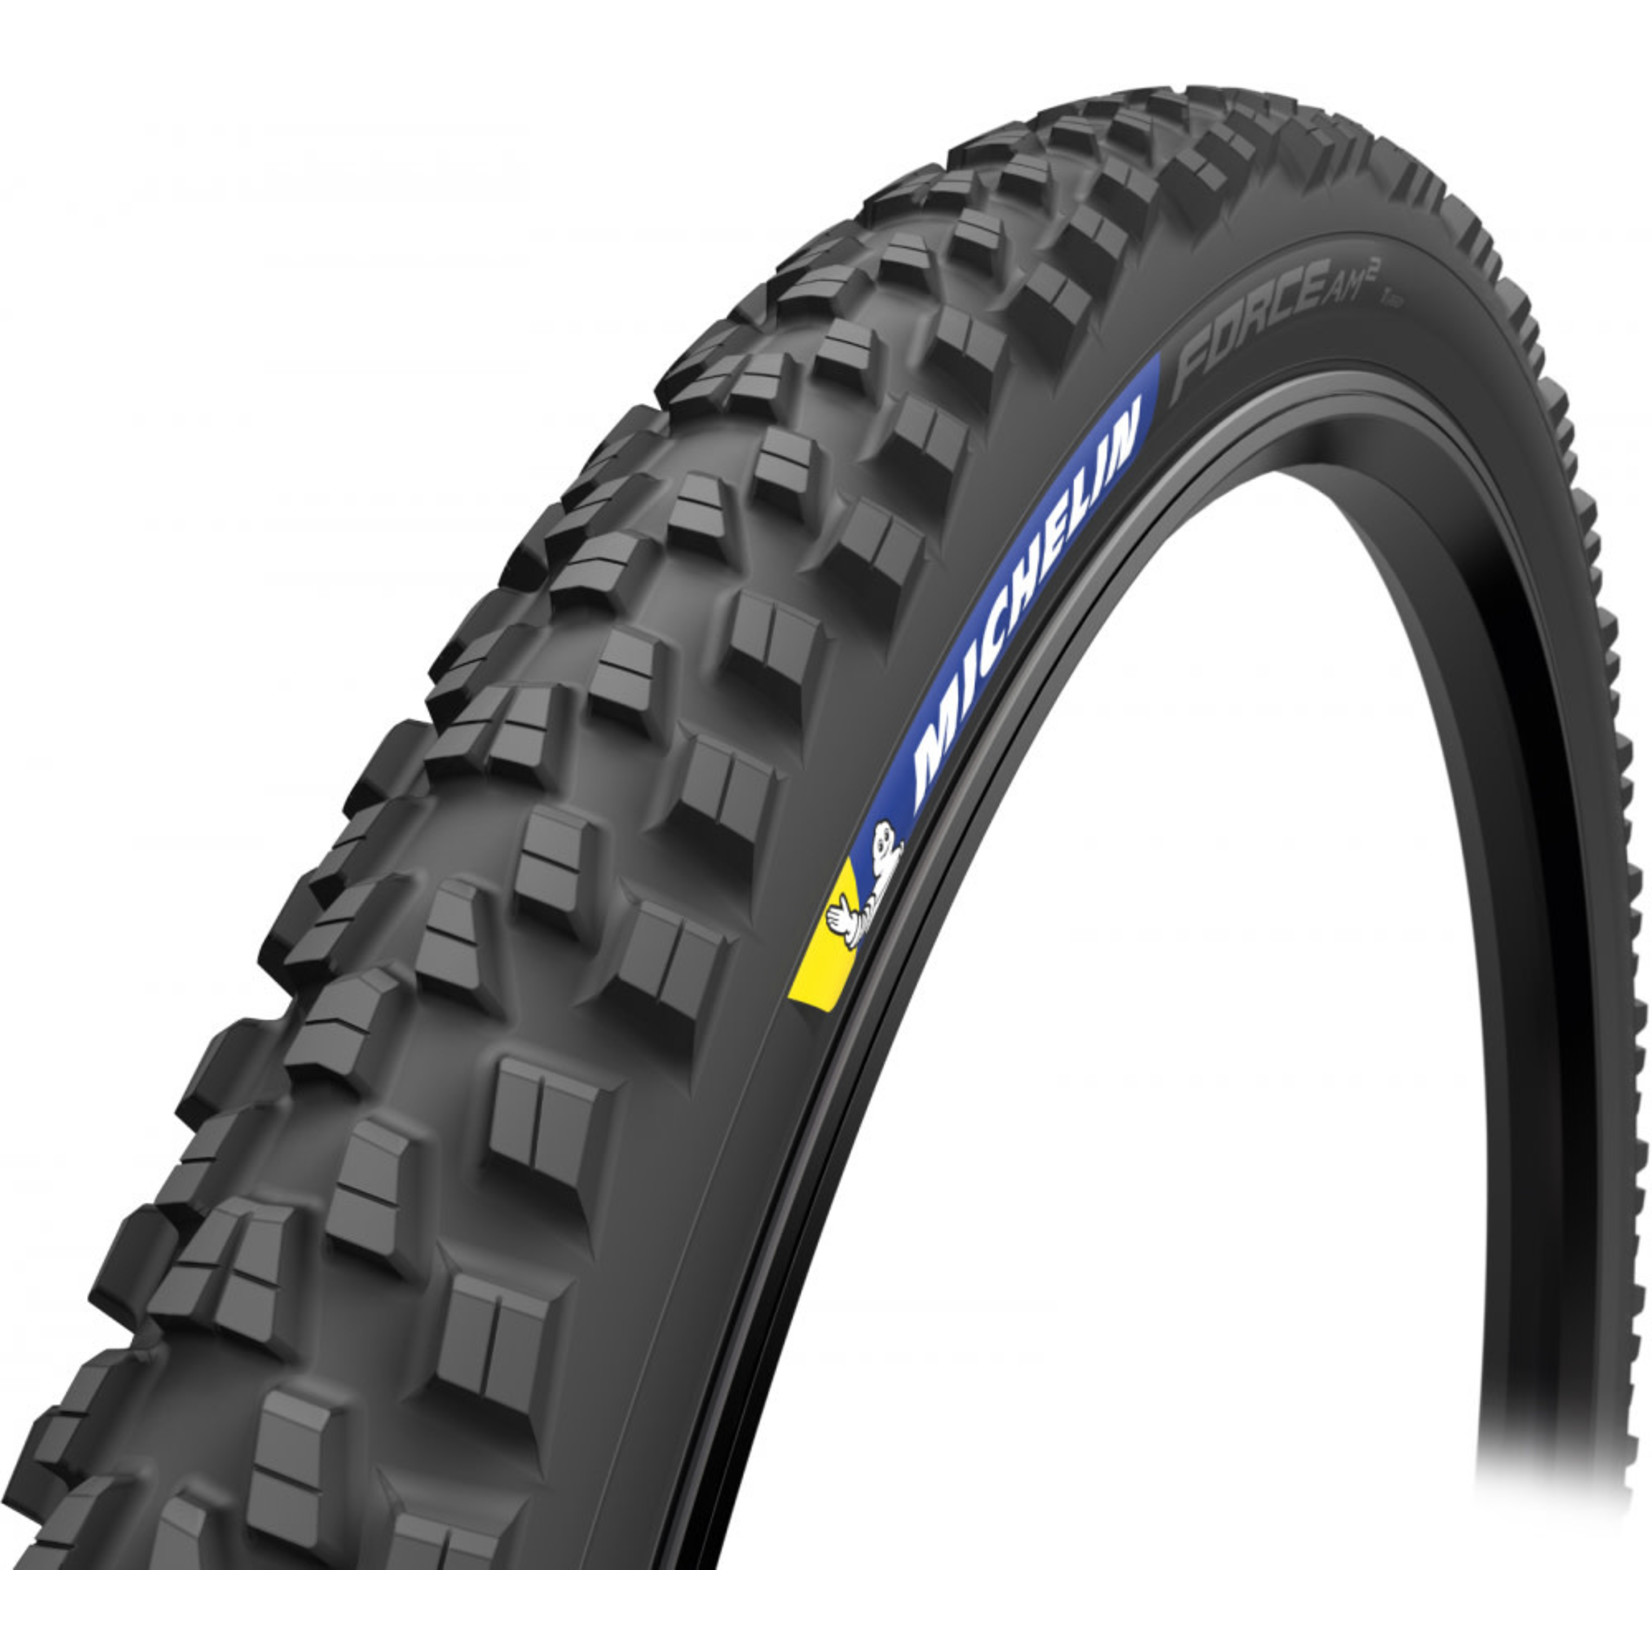 "MICHELIN Michelin - Force AM"" 29x2.40 Tubless Ready"